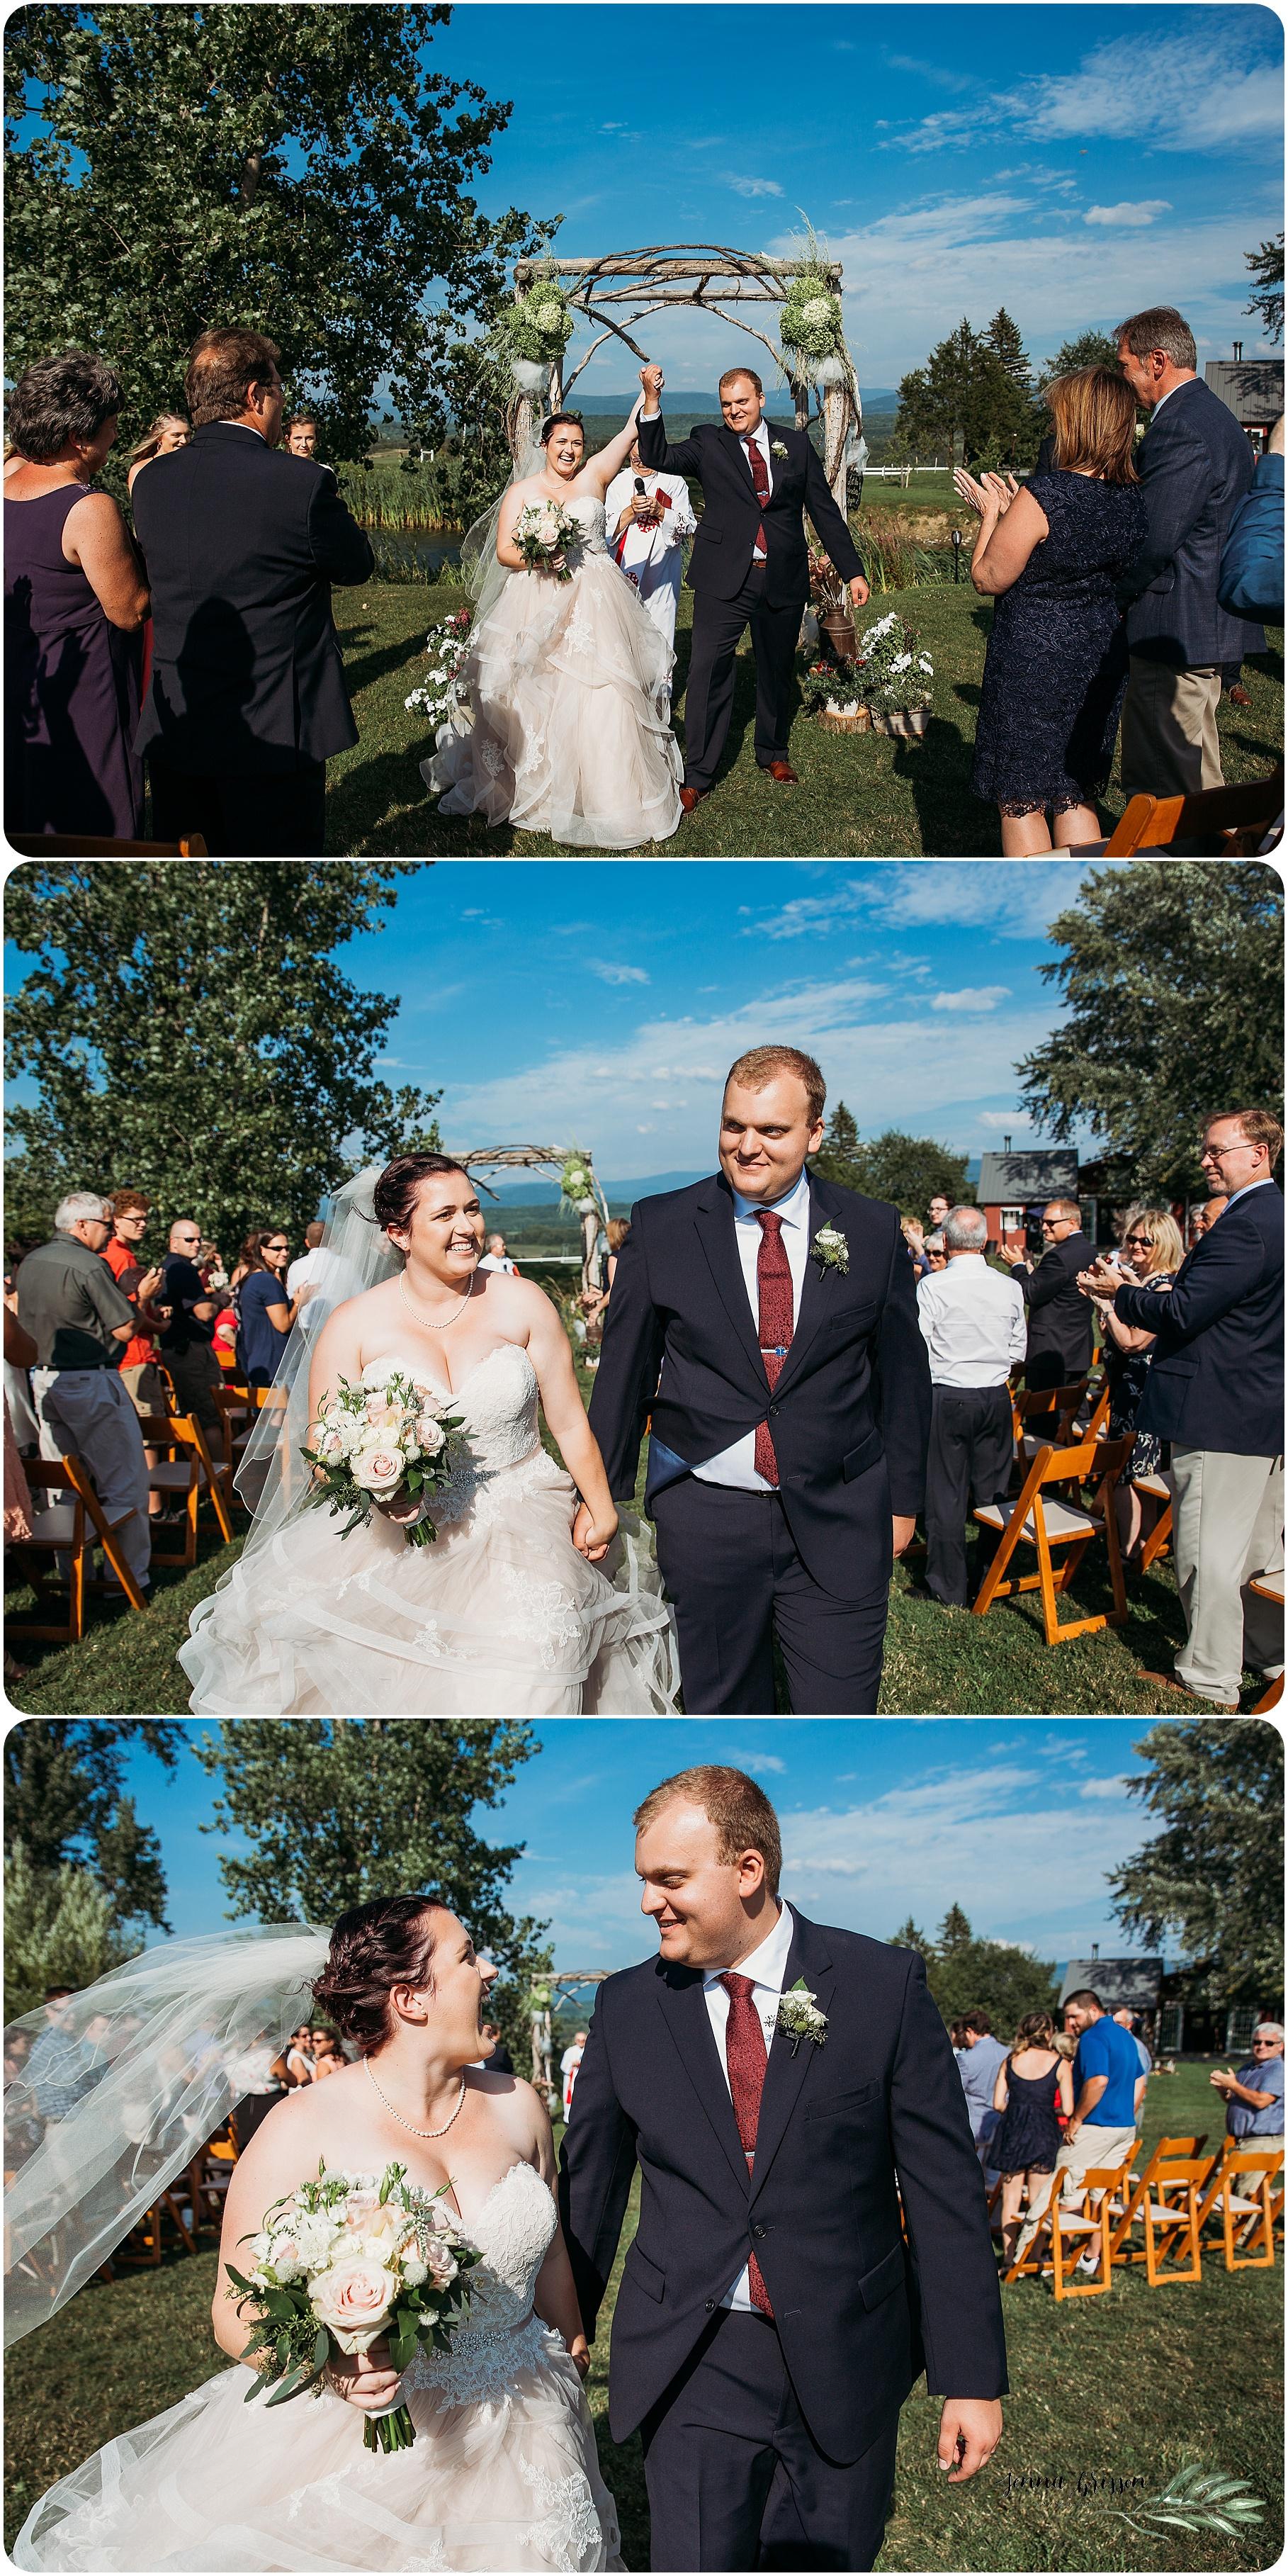 Candid Wedding Photography Vermont